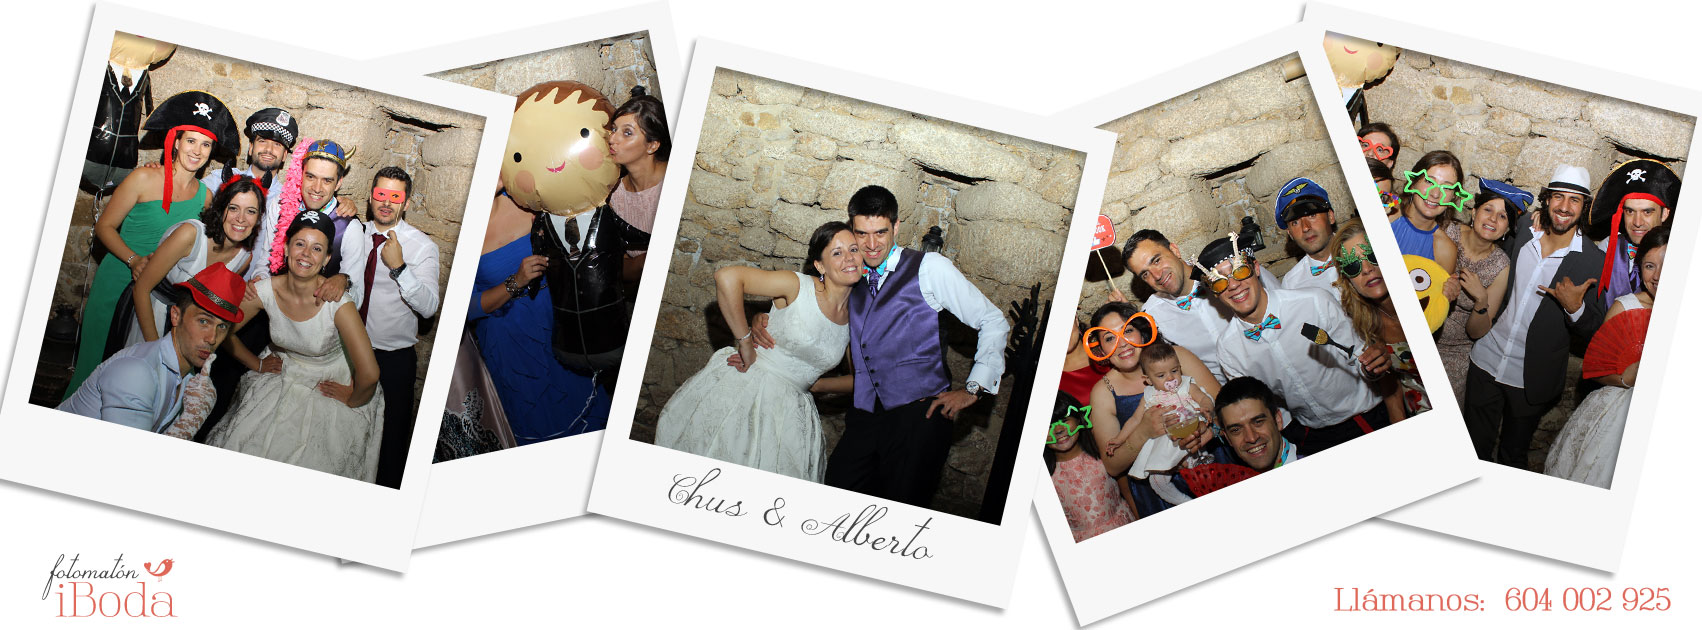 Chus & Alberto